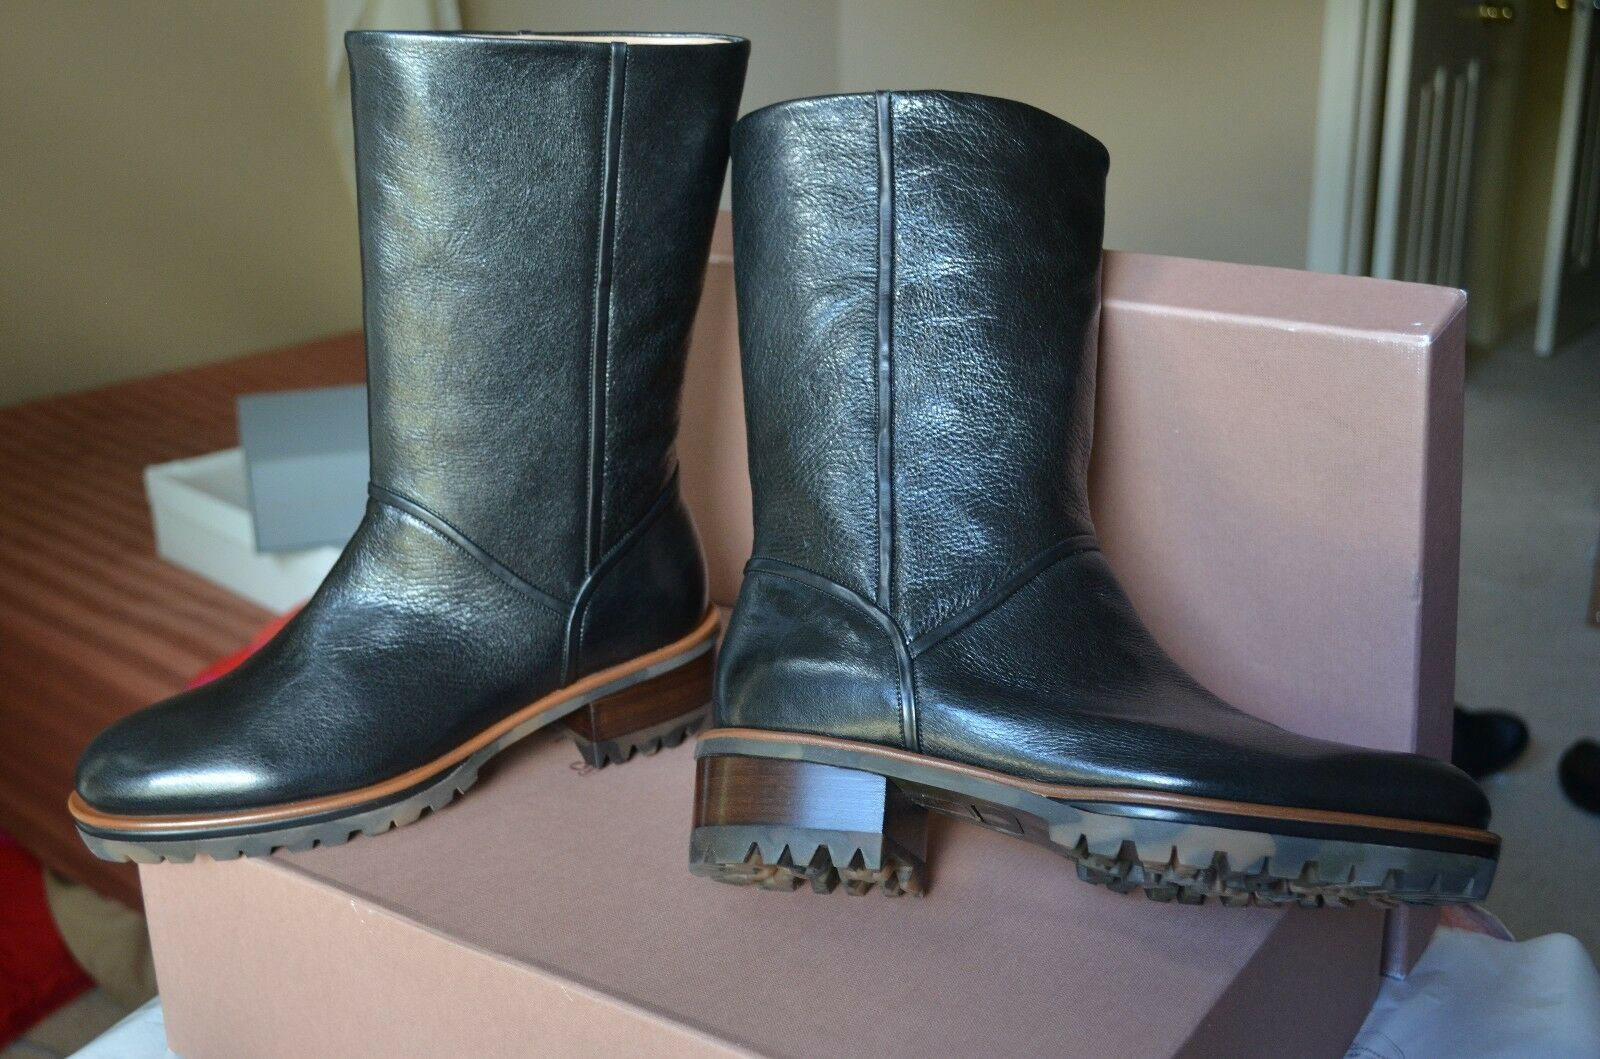 New Women's Boots Eva Turner Black Leather Combat Riding Sz Euro 7 Mid-Calf High